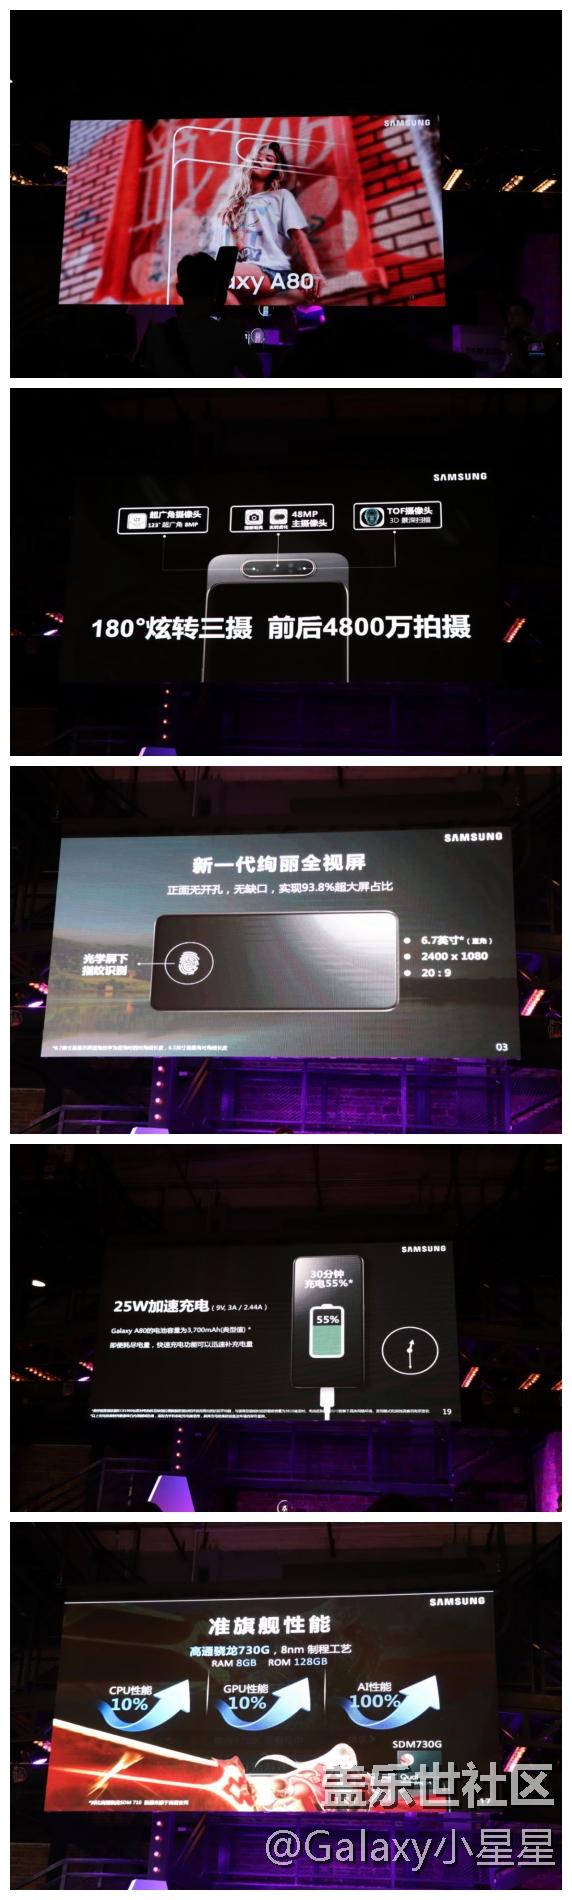 【Galaxy A品鉴会】重返中国战场,实力A系列新机